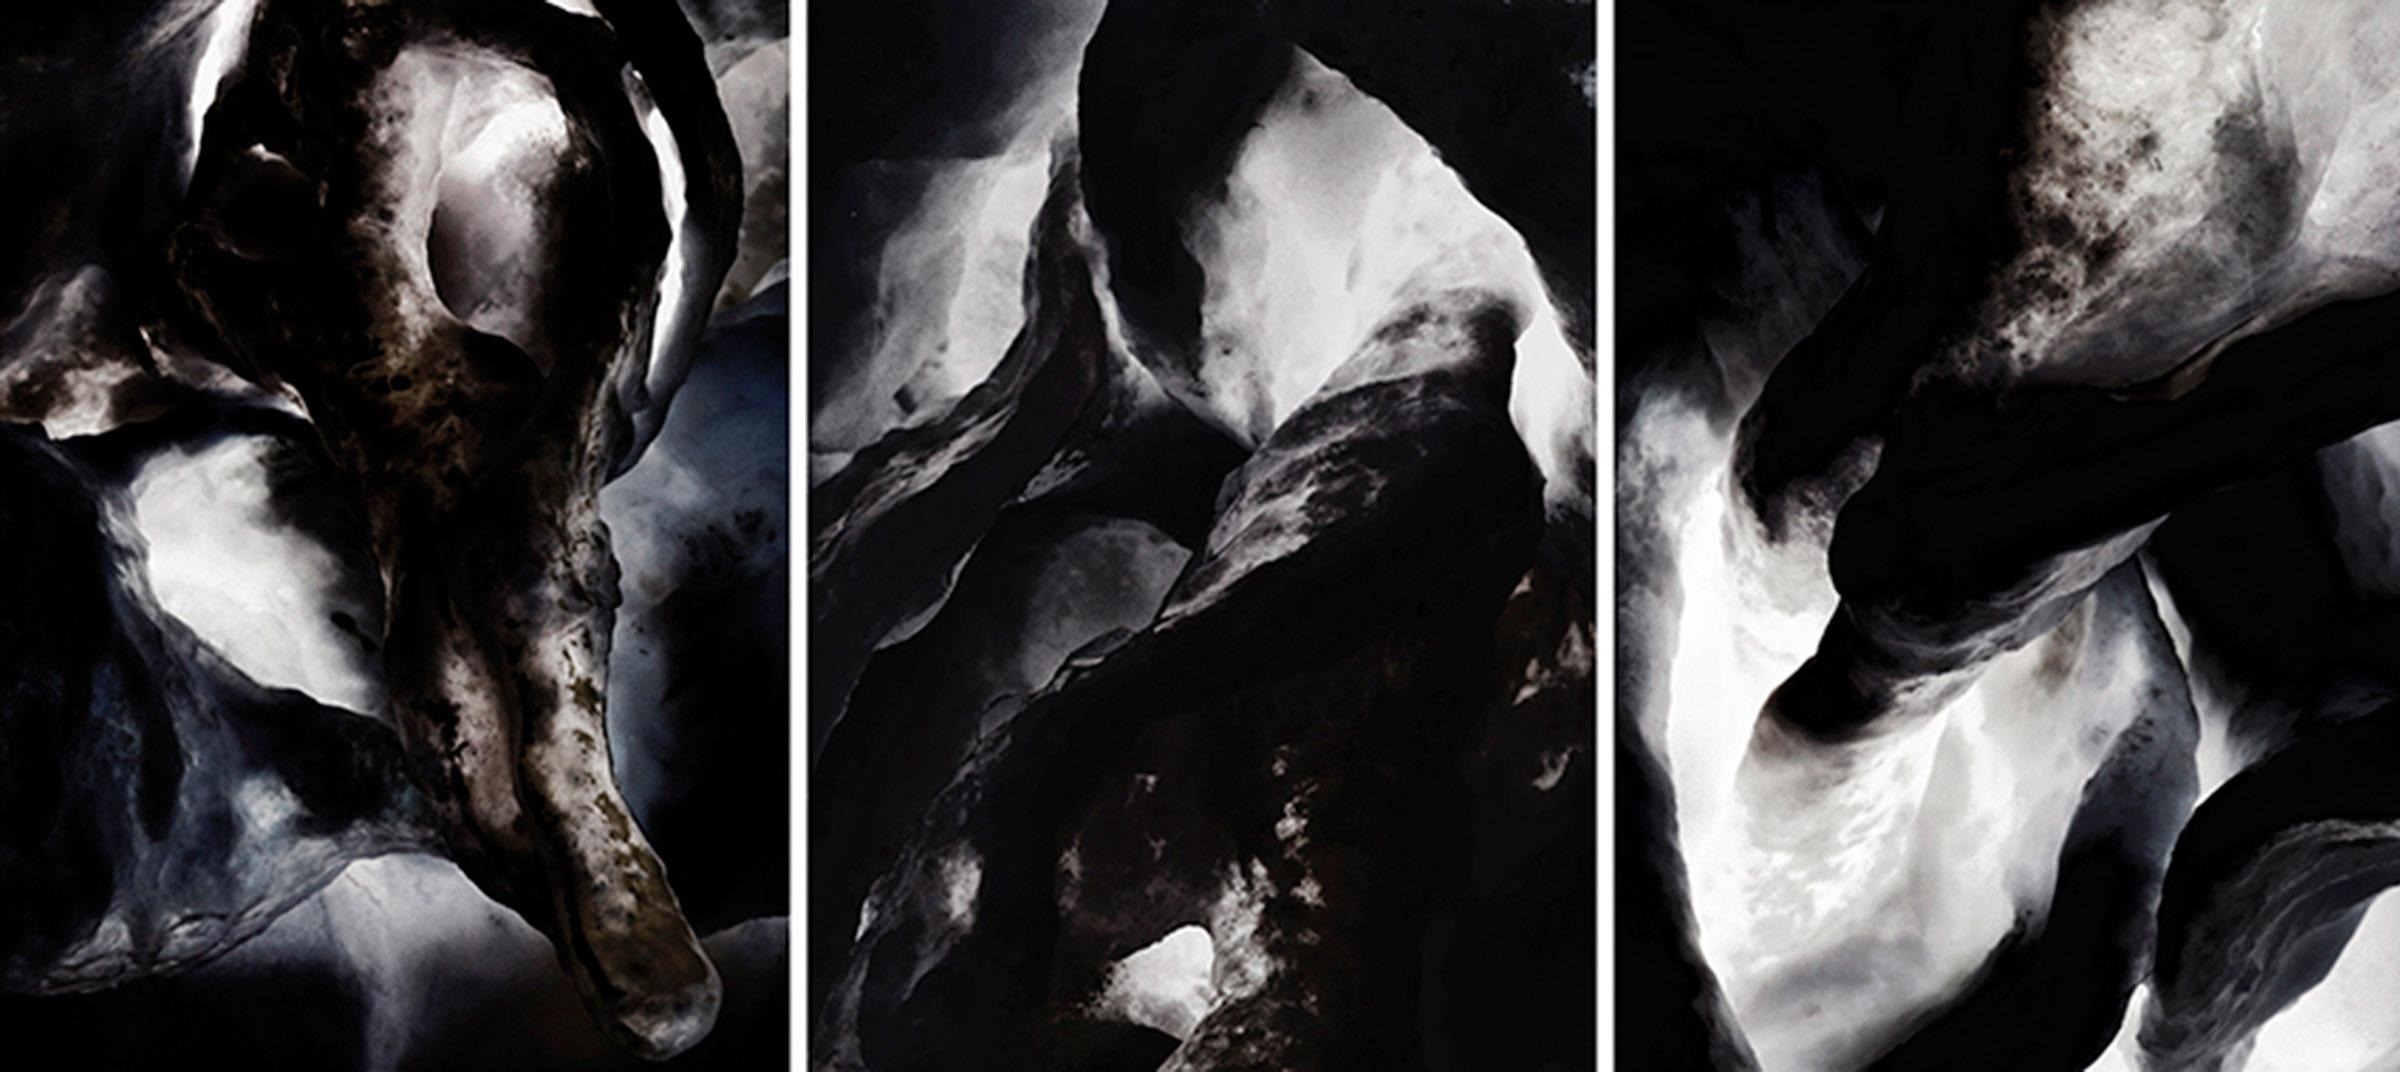 X 23  Triptych N°3, 2014/2015 Tirage gélatino argentique, 3 panneaux 144 x 104 cm chacun |Gelatin silver print, 3 panels 56,69 x 40,94 inches each  4/4